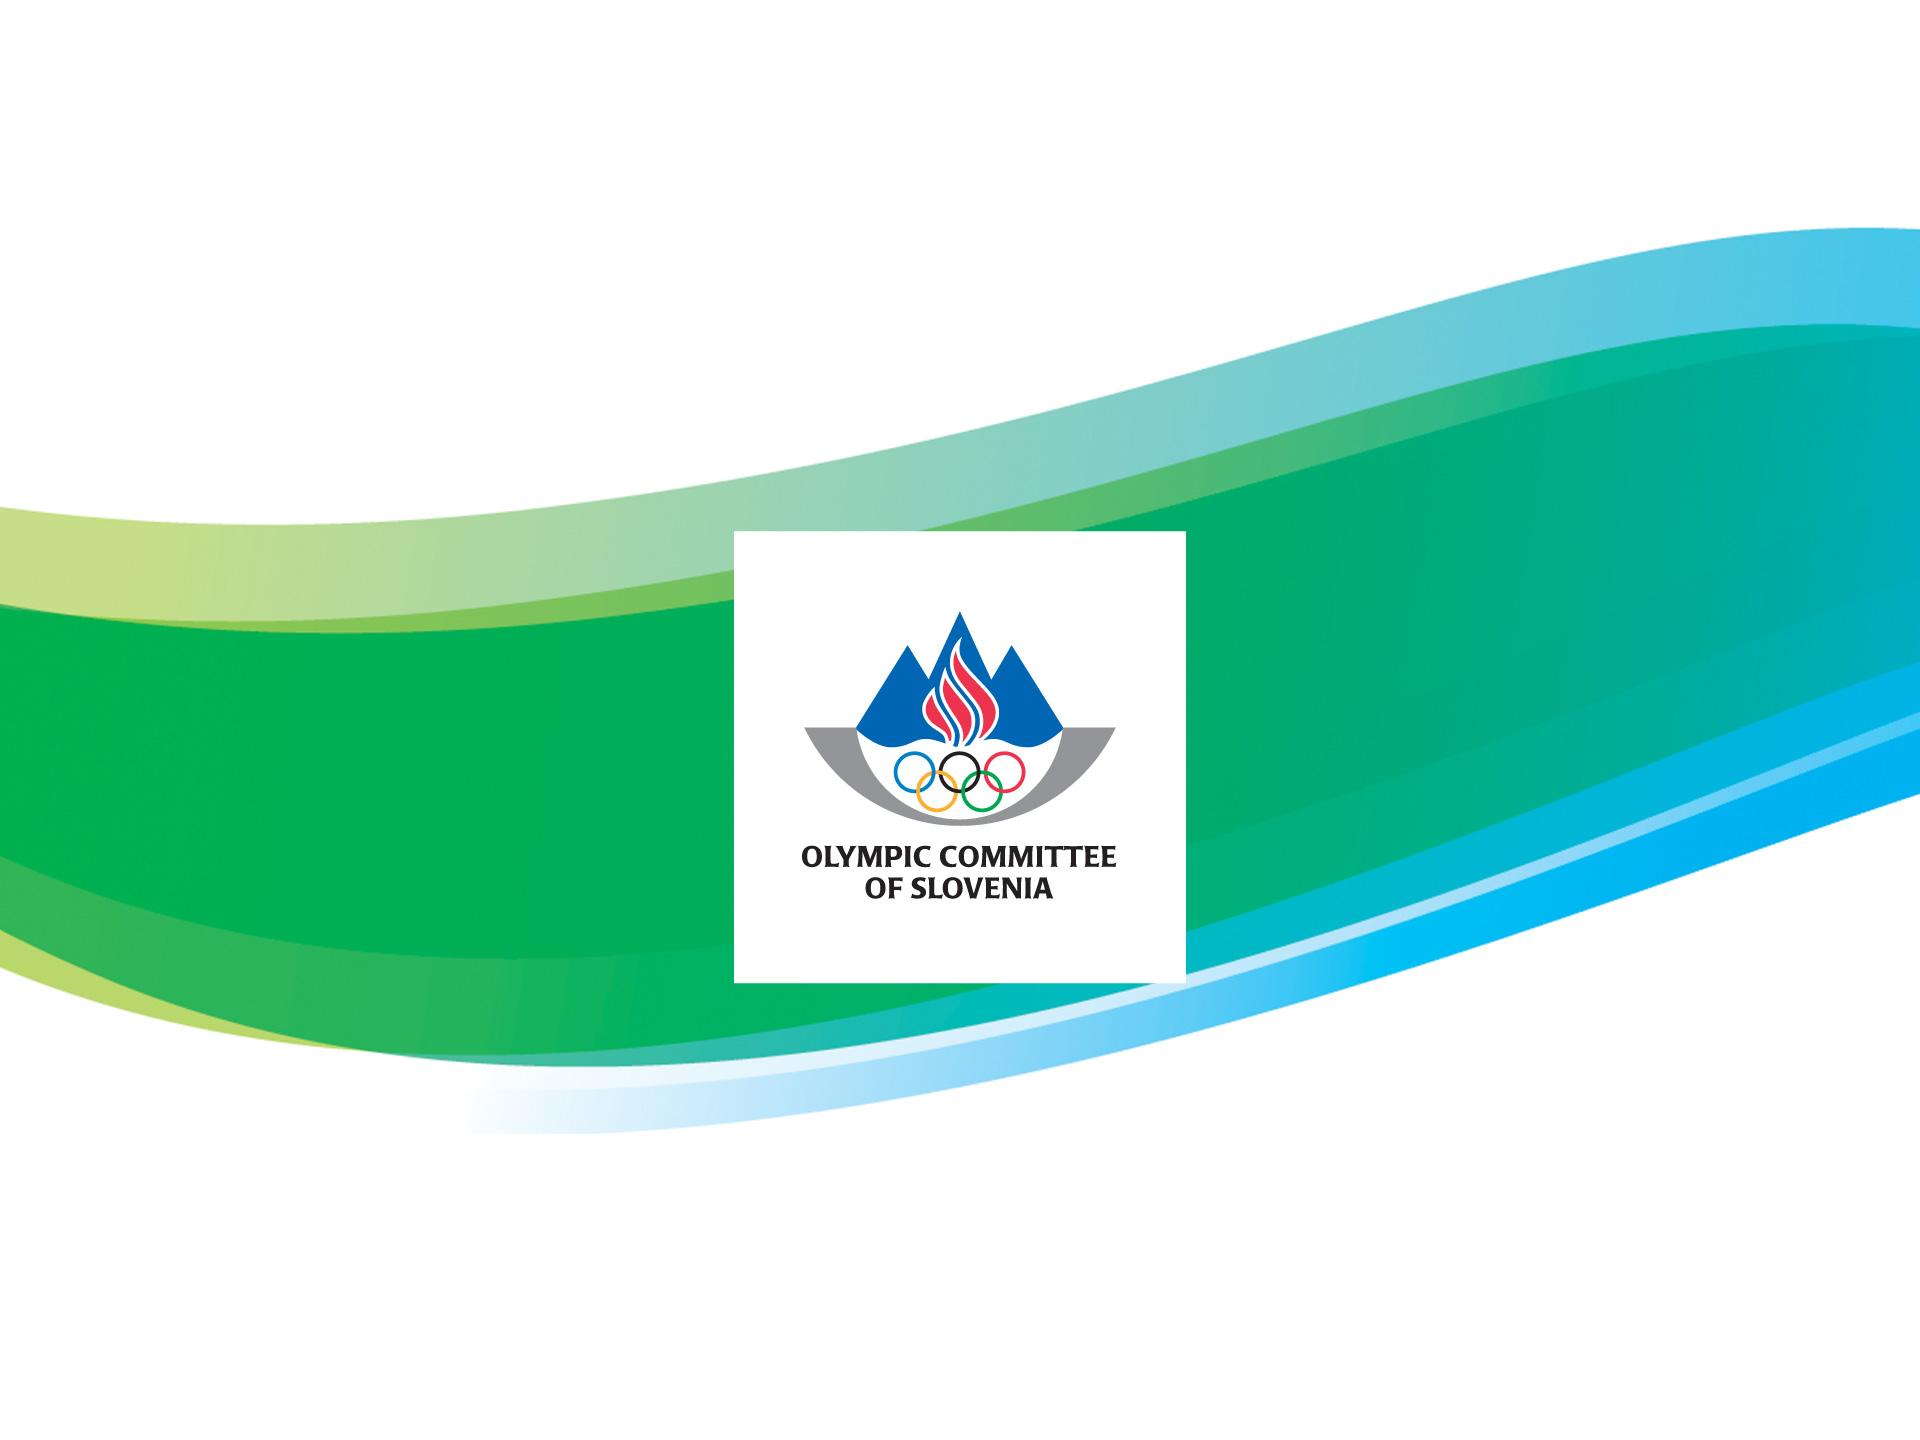 KW_www2016_Olympic_Committee_SLO